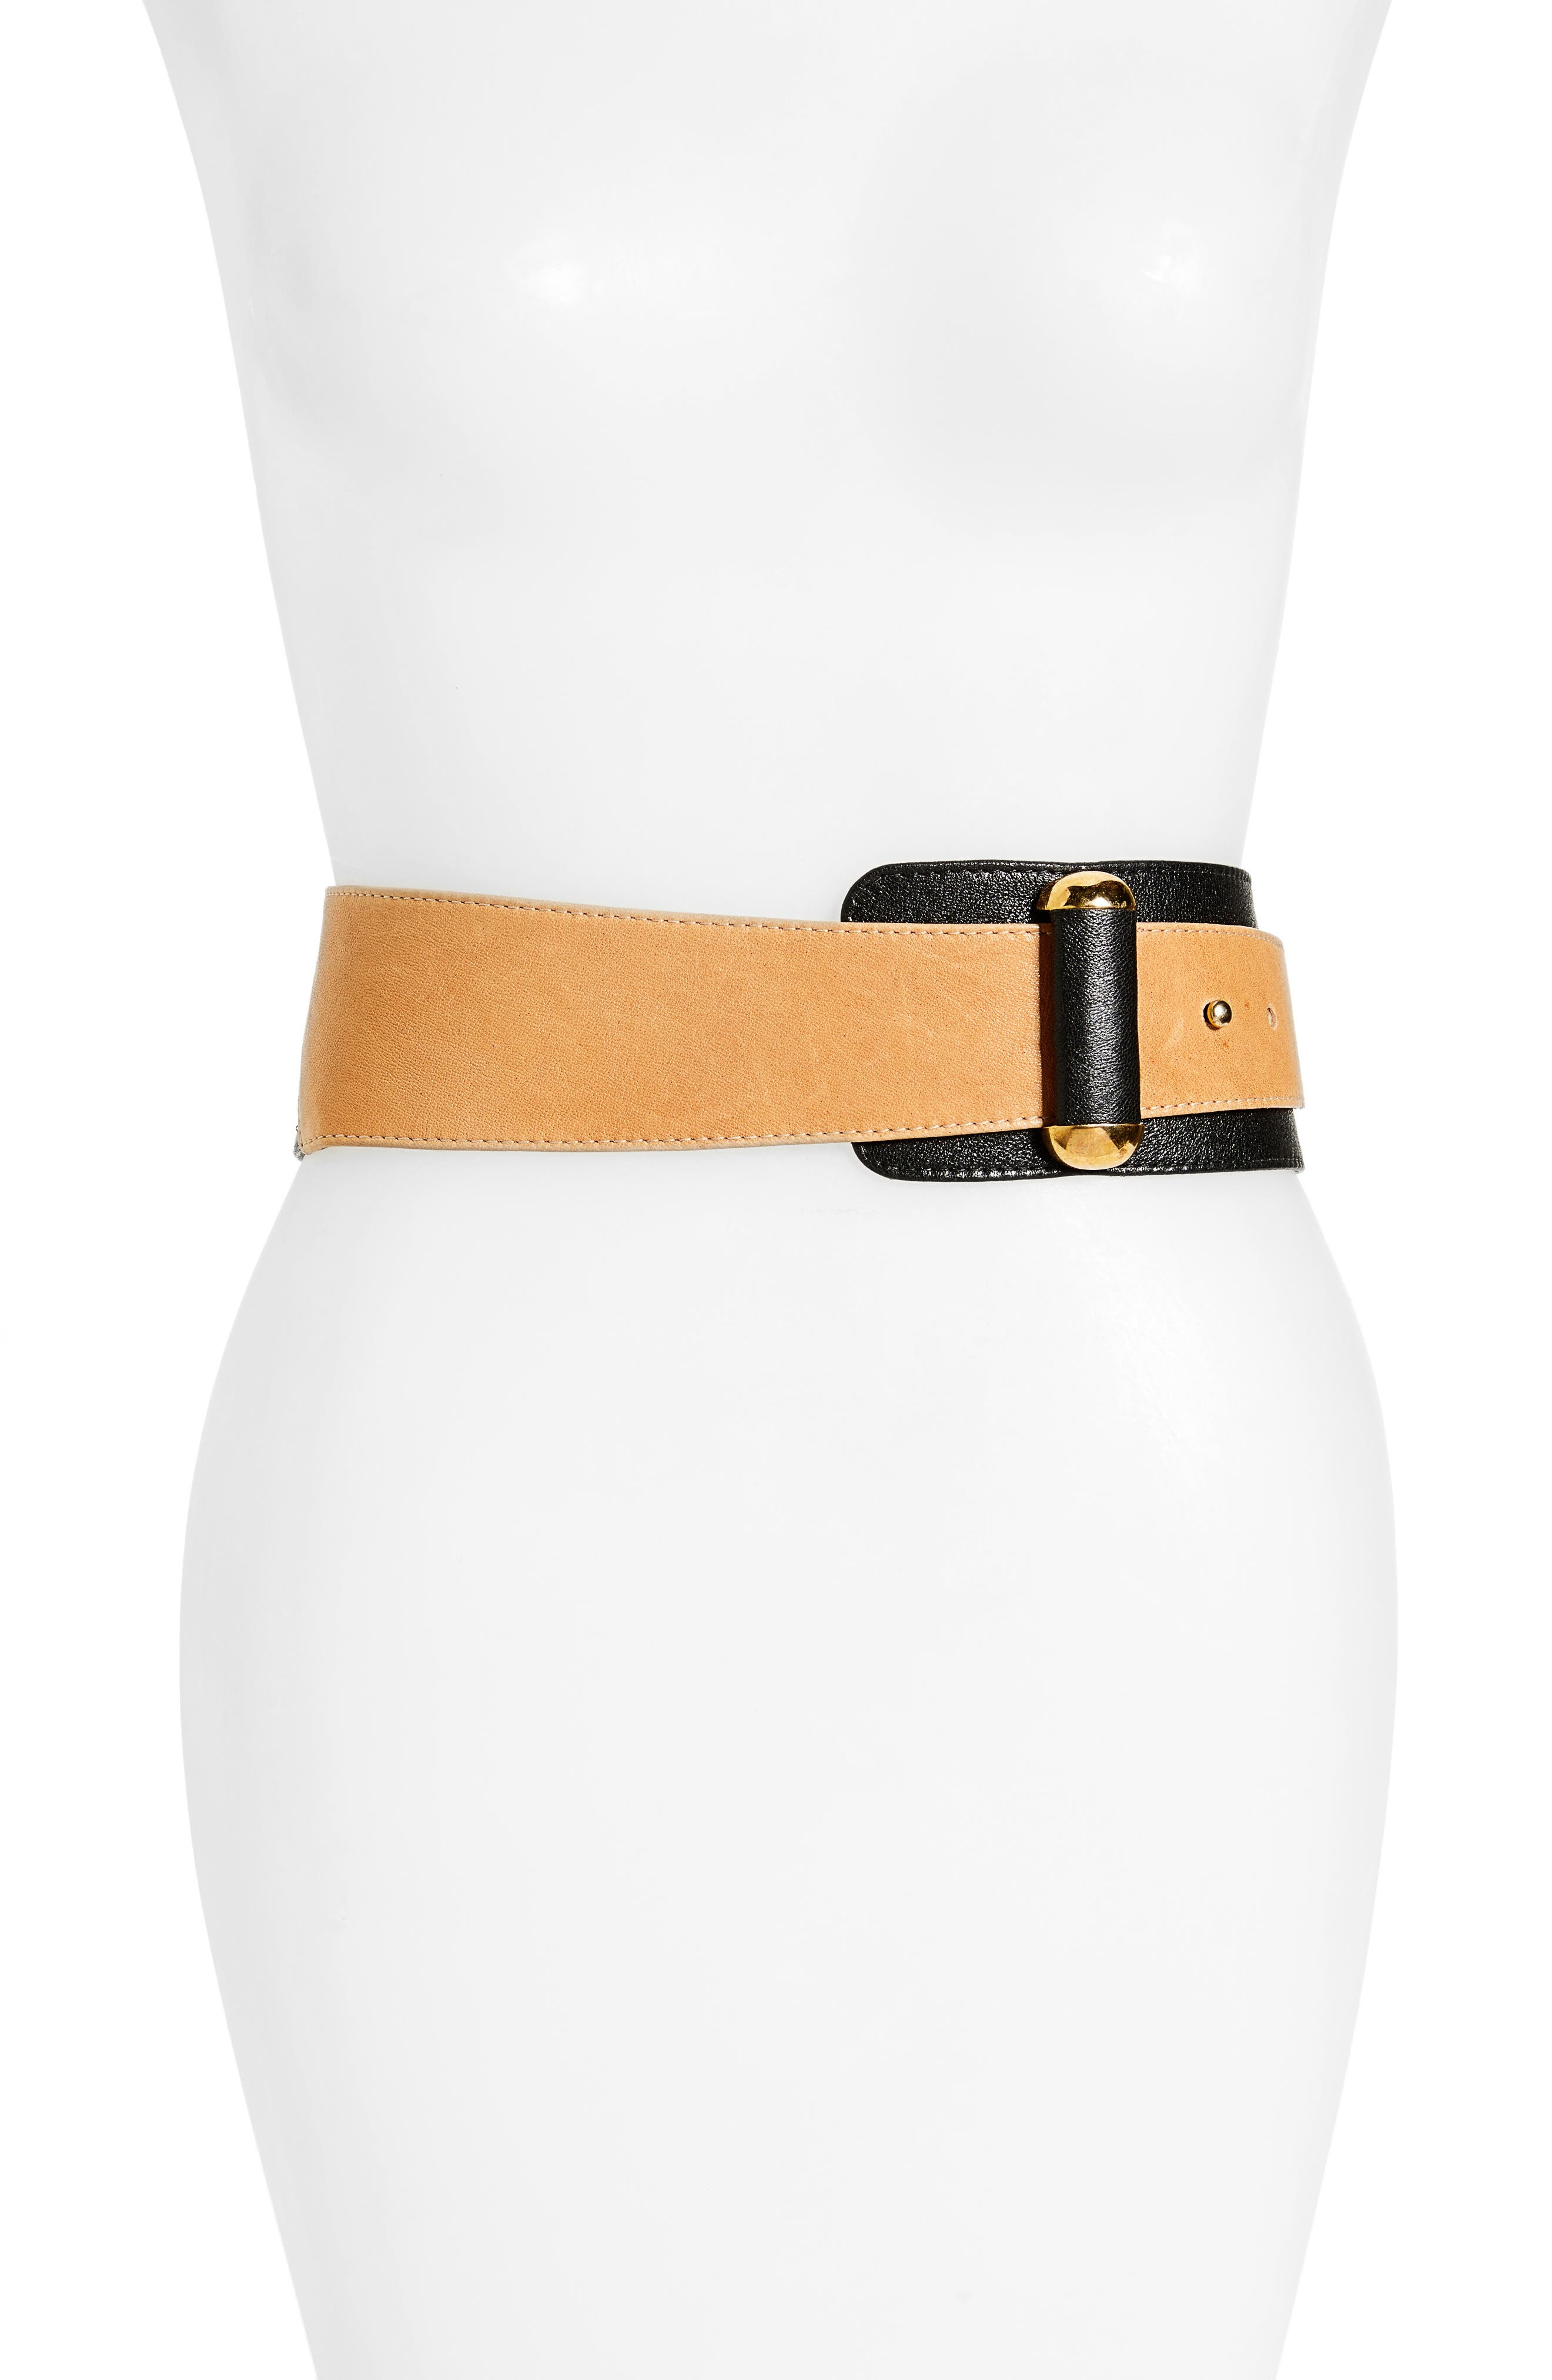 Raina Vixen Leather Belt, Black/ Brown